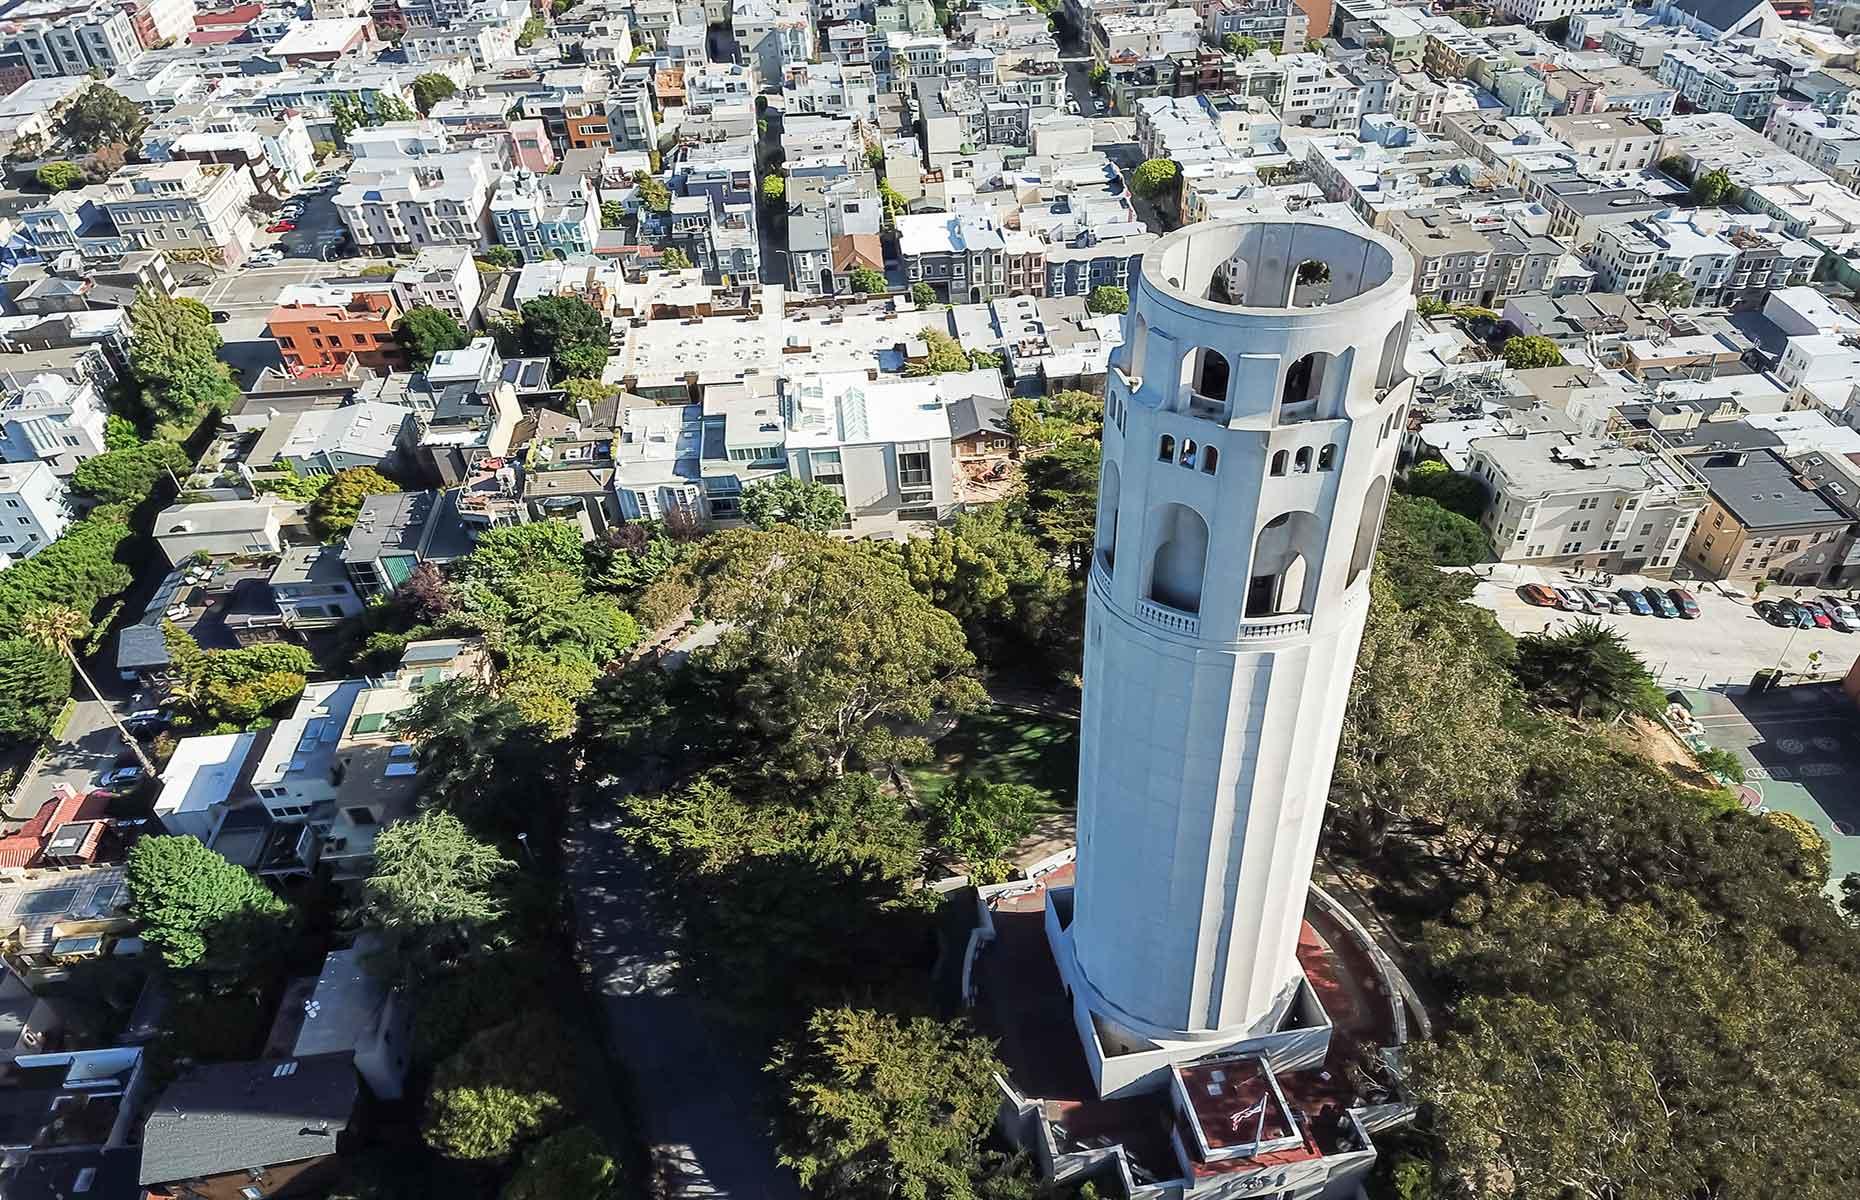 Coit Tower (Image: Trong Nguyen/Shutterstock)